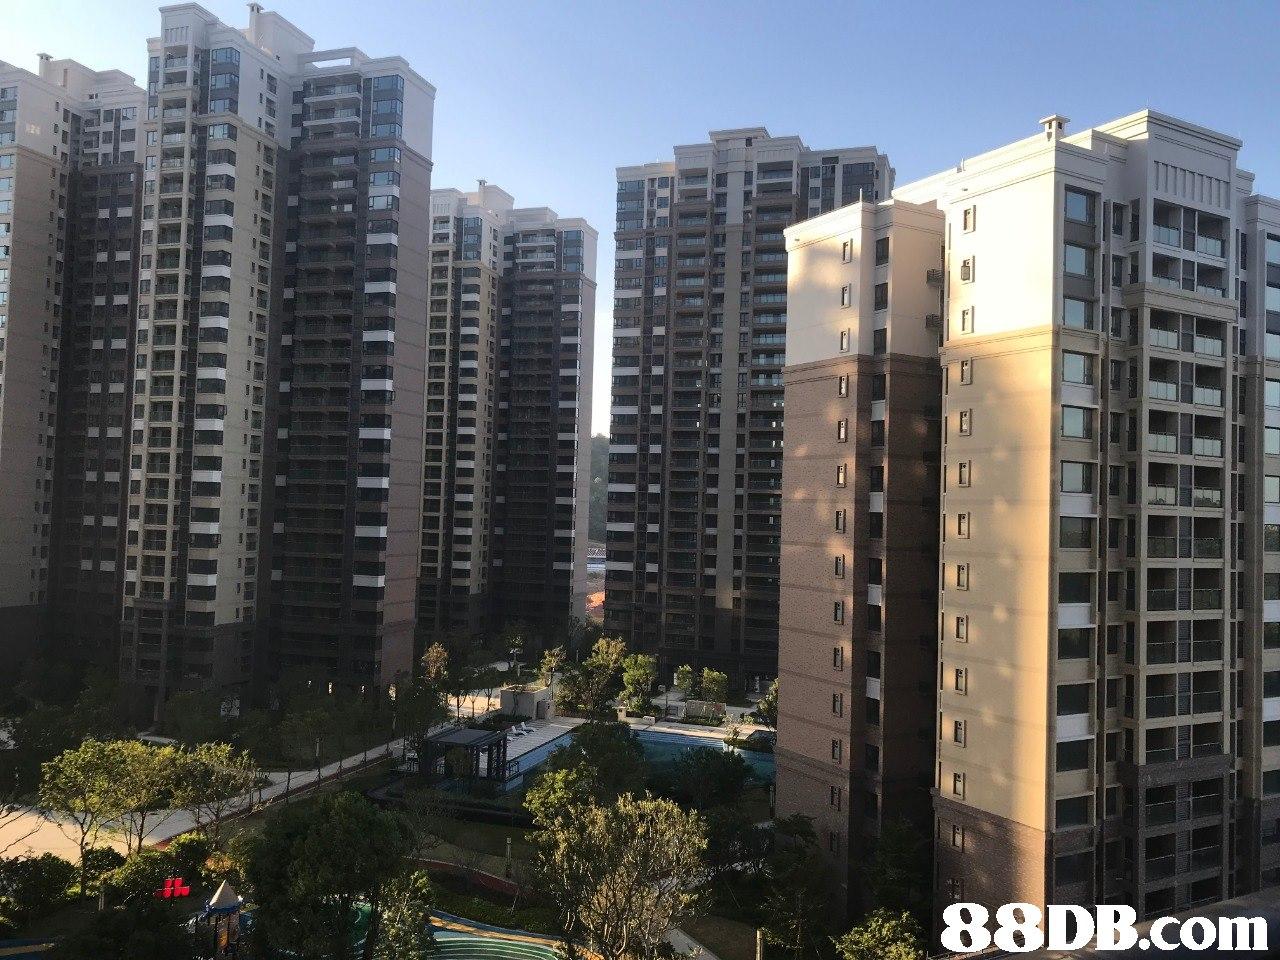 88 DB.com  metropolitan area,condominium,building,tower block,property